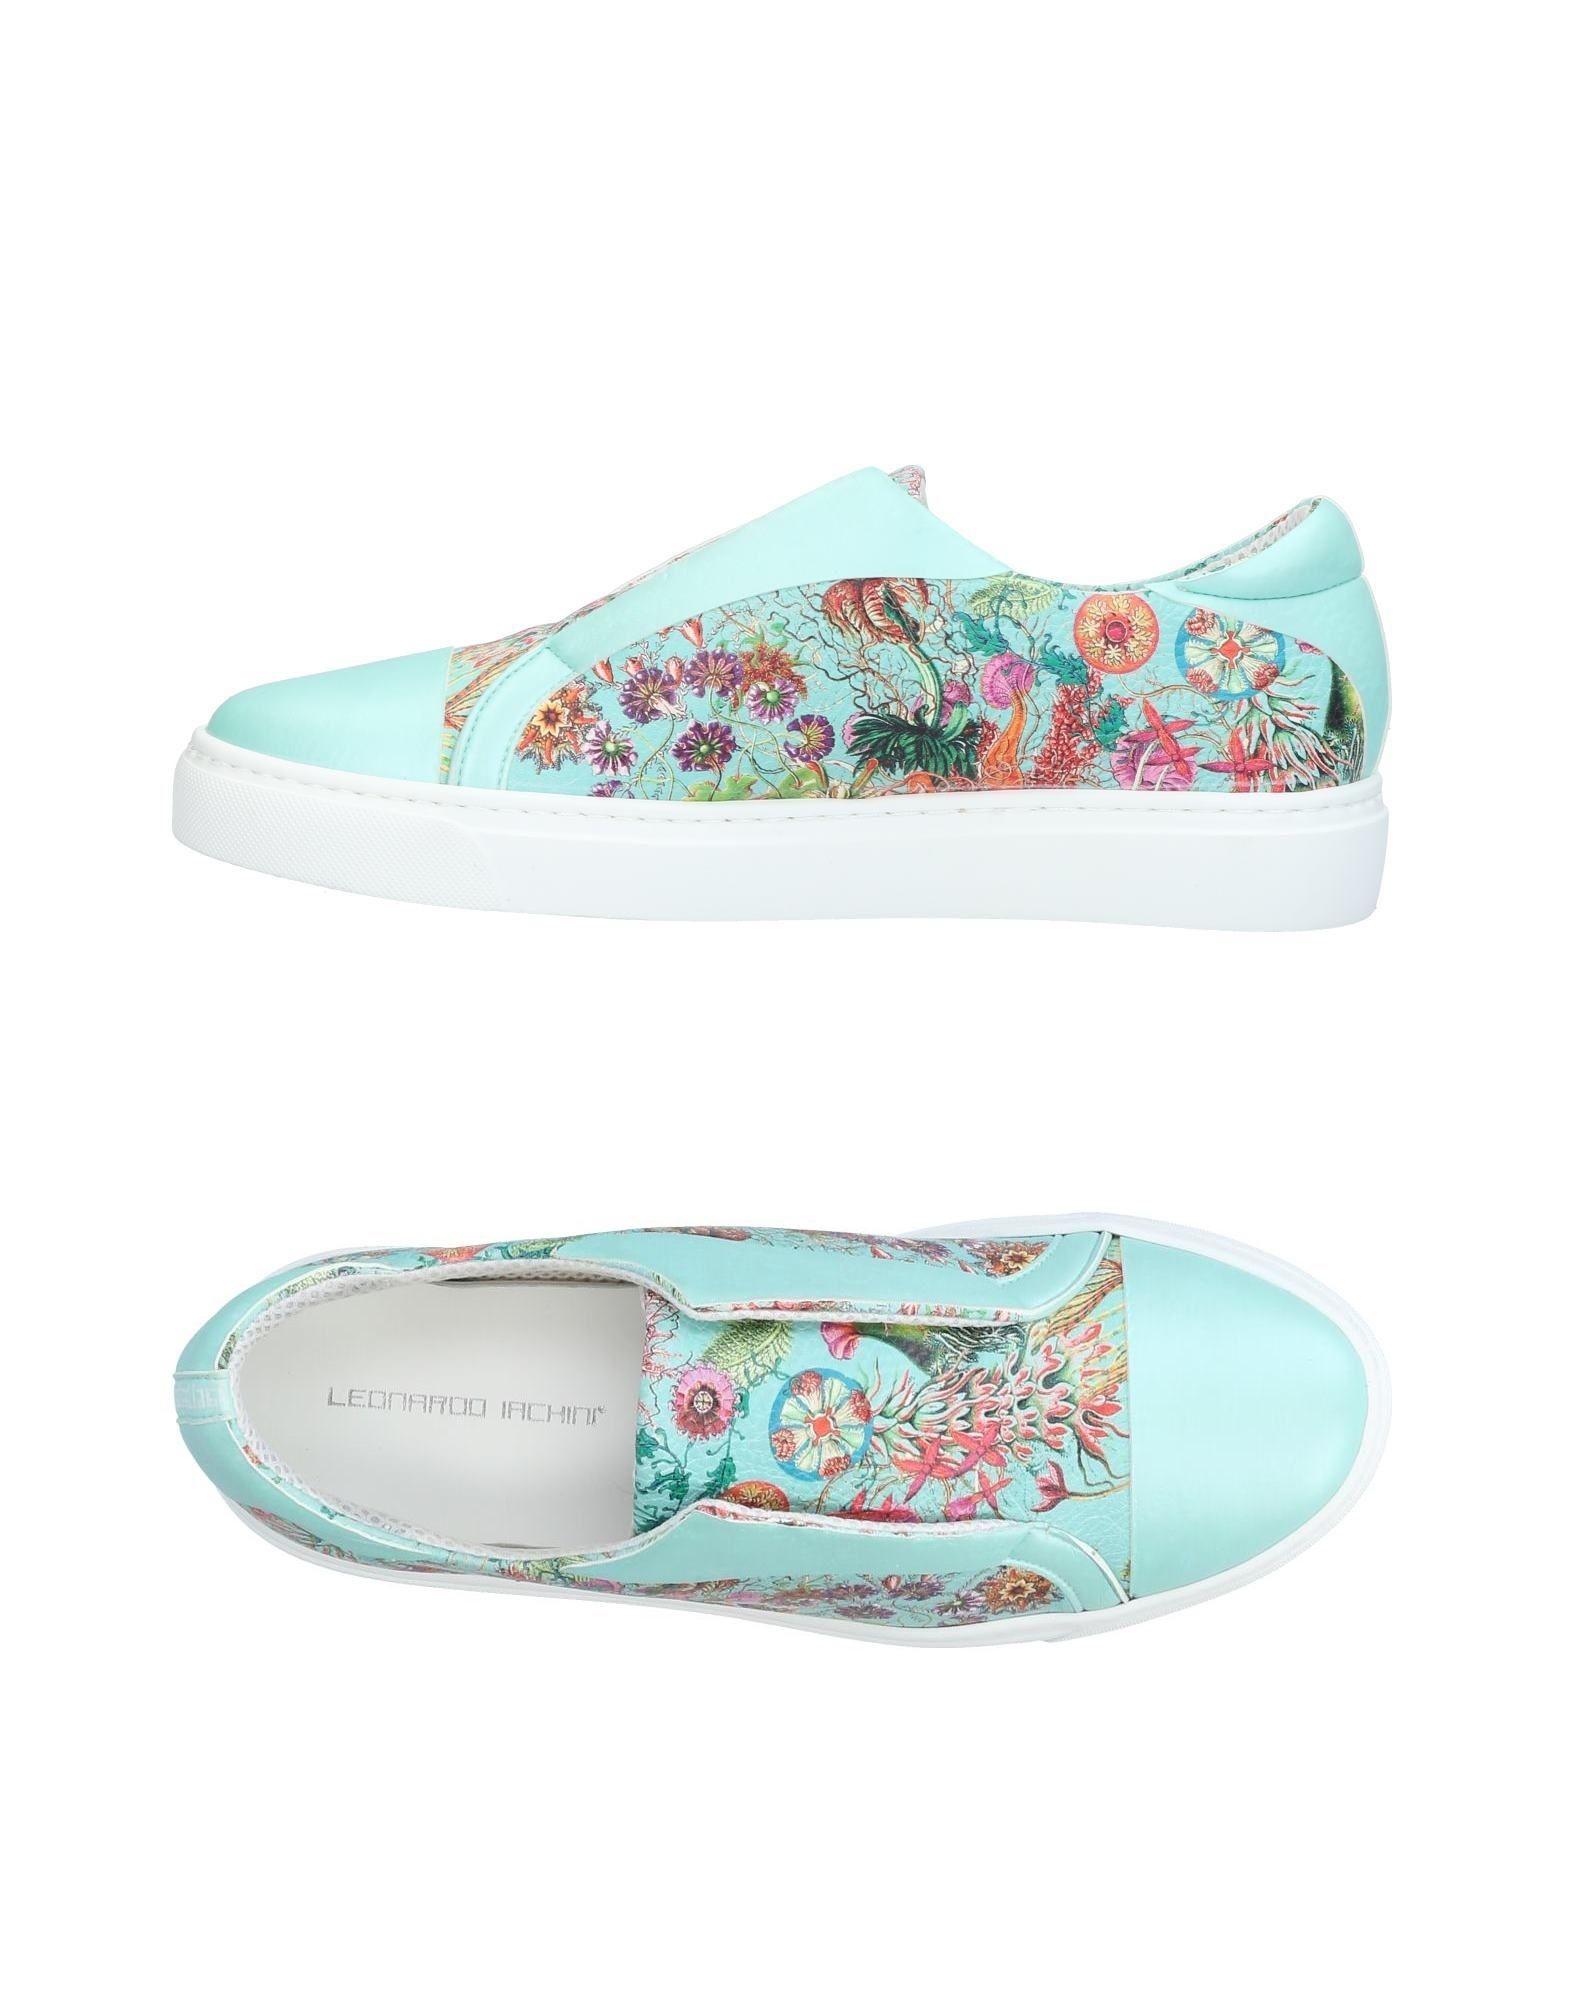 Leonardo Iachini Sneakers Damen  11460511XJ Gute Qualität beliebte Schuhe